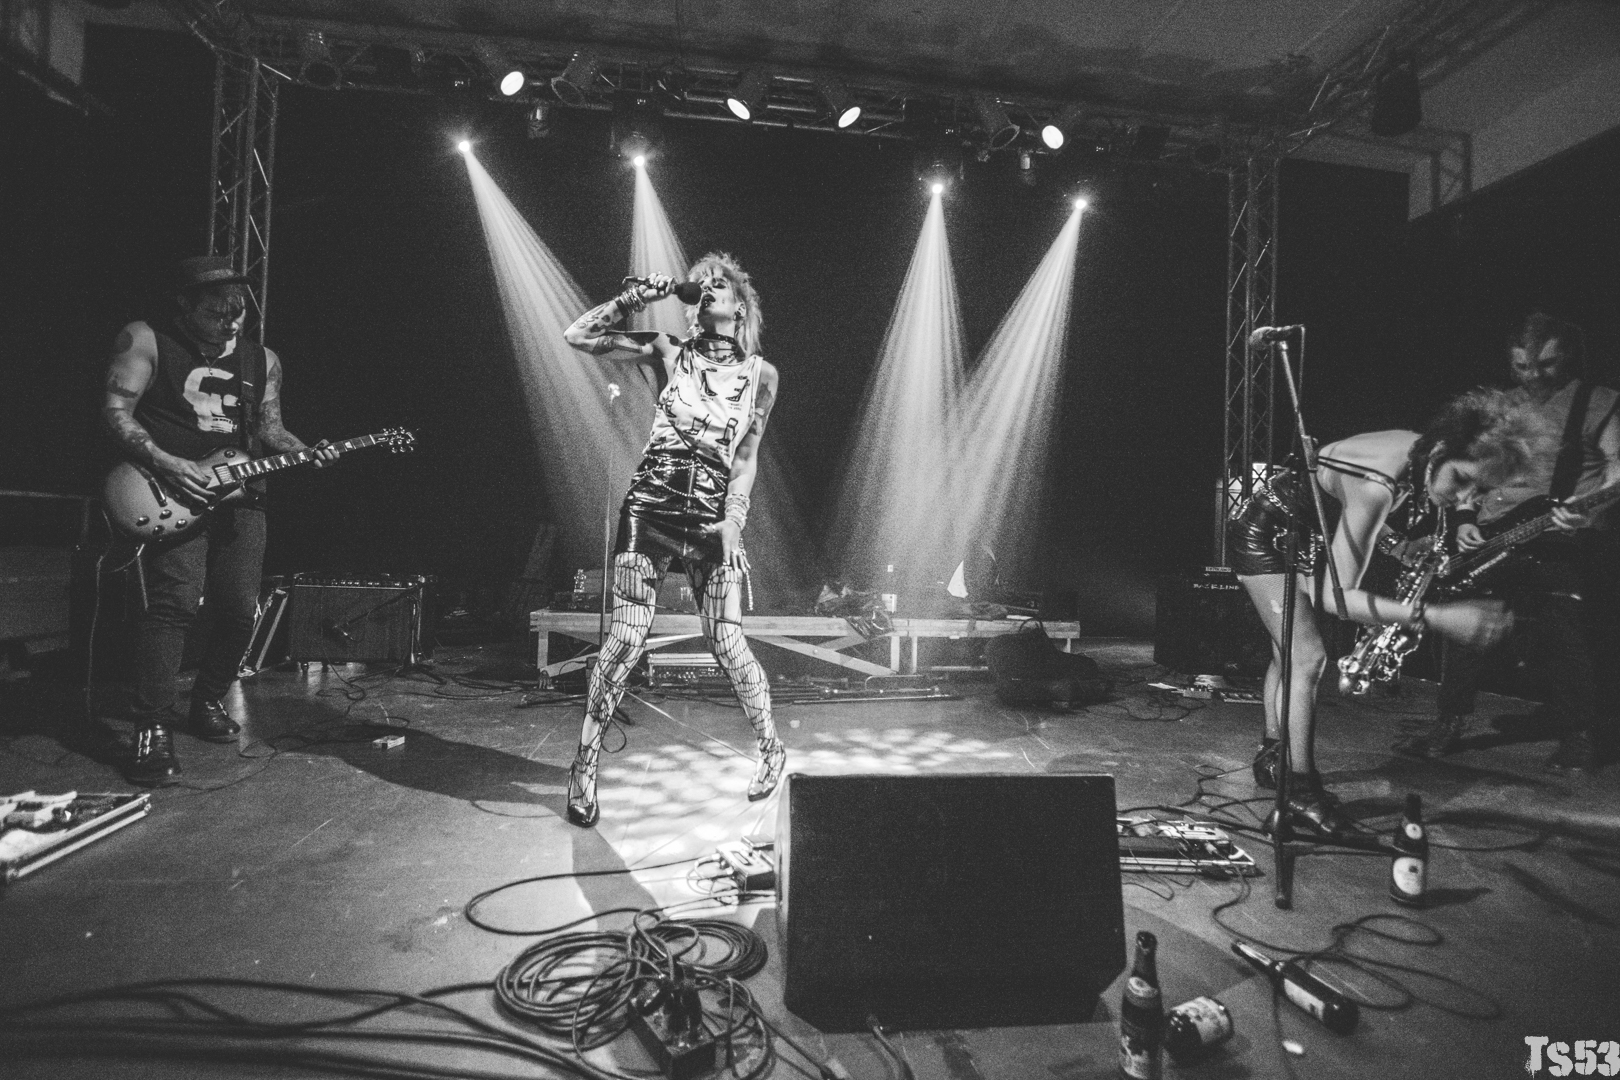 Frauen im Musikbusiness - TOTENWALD 2